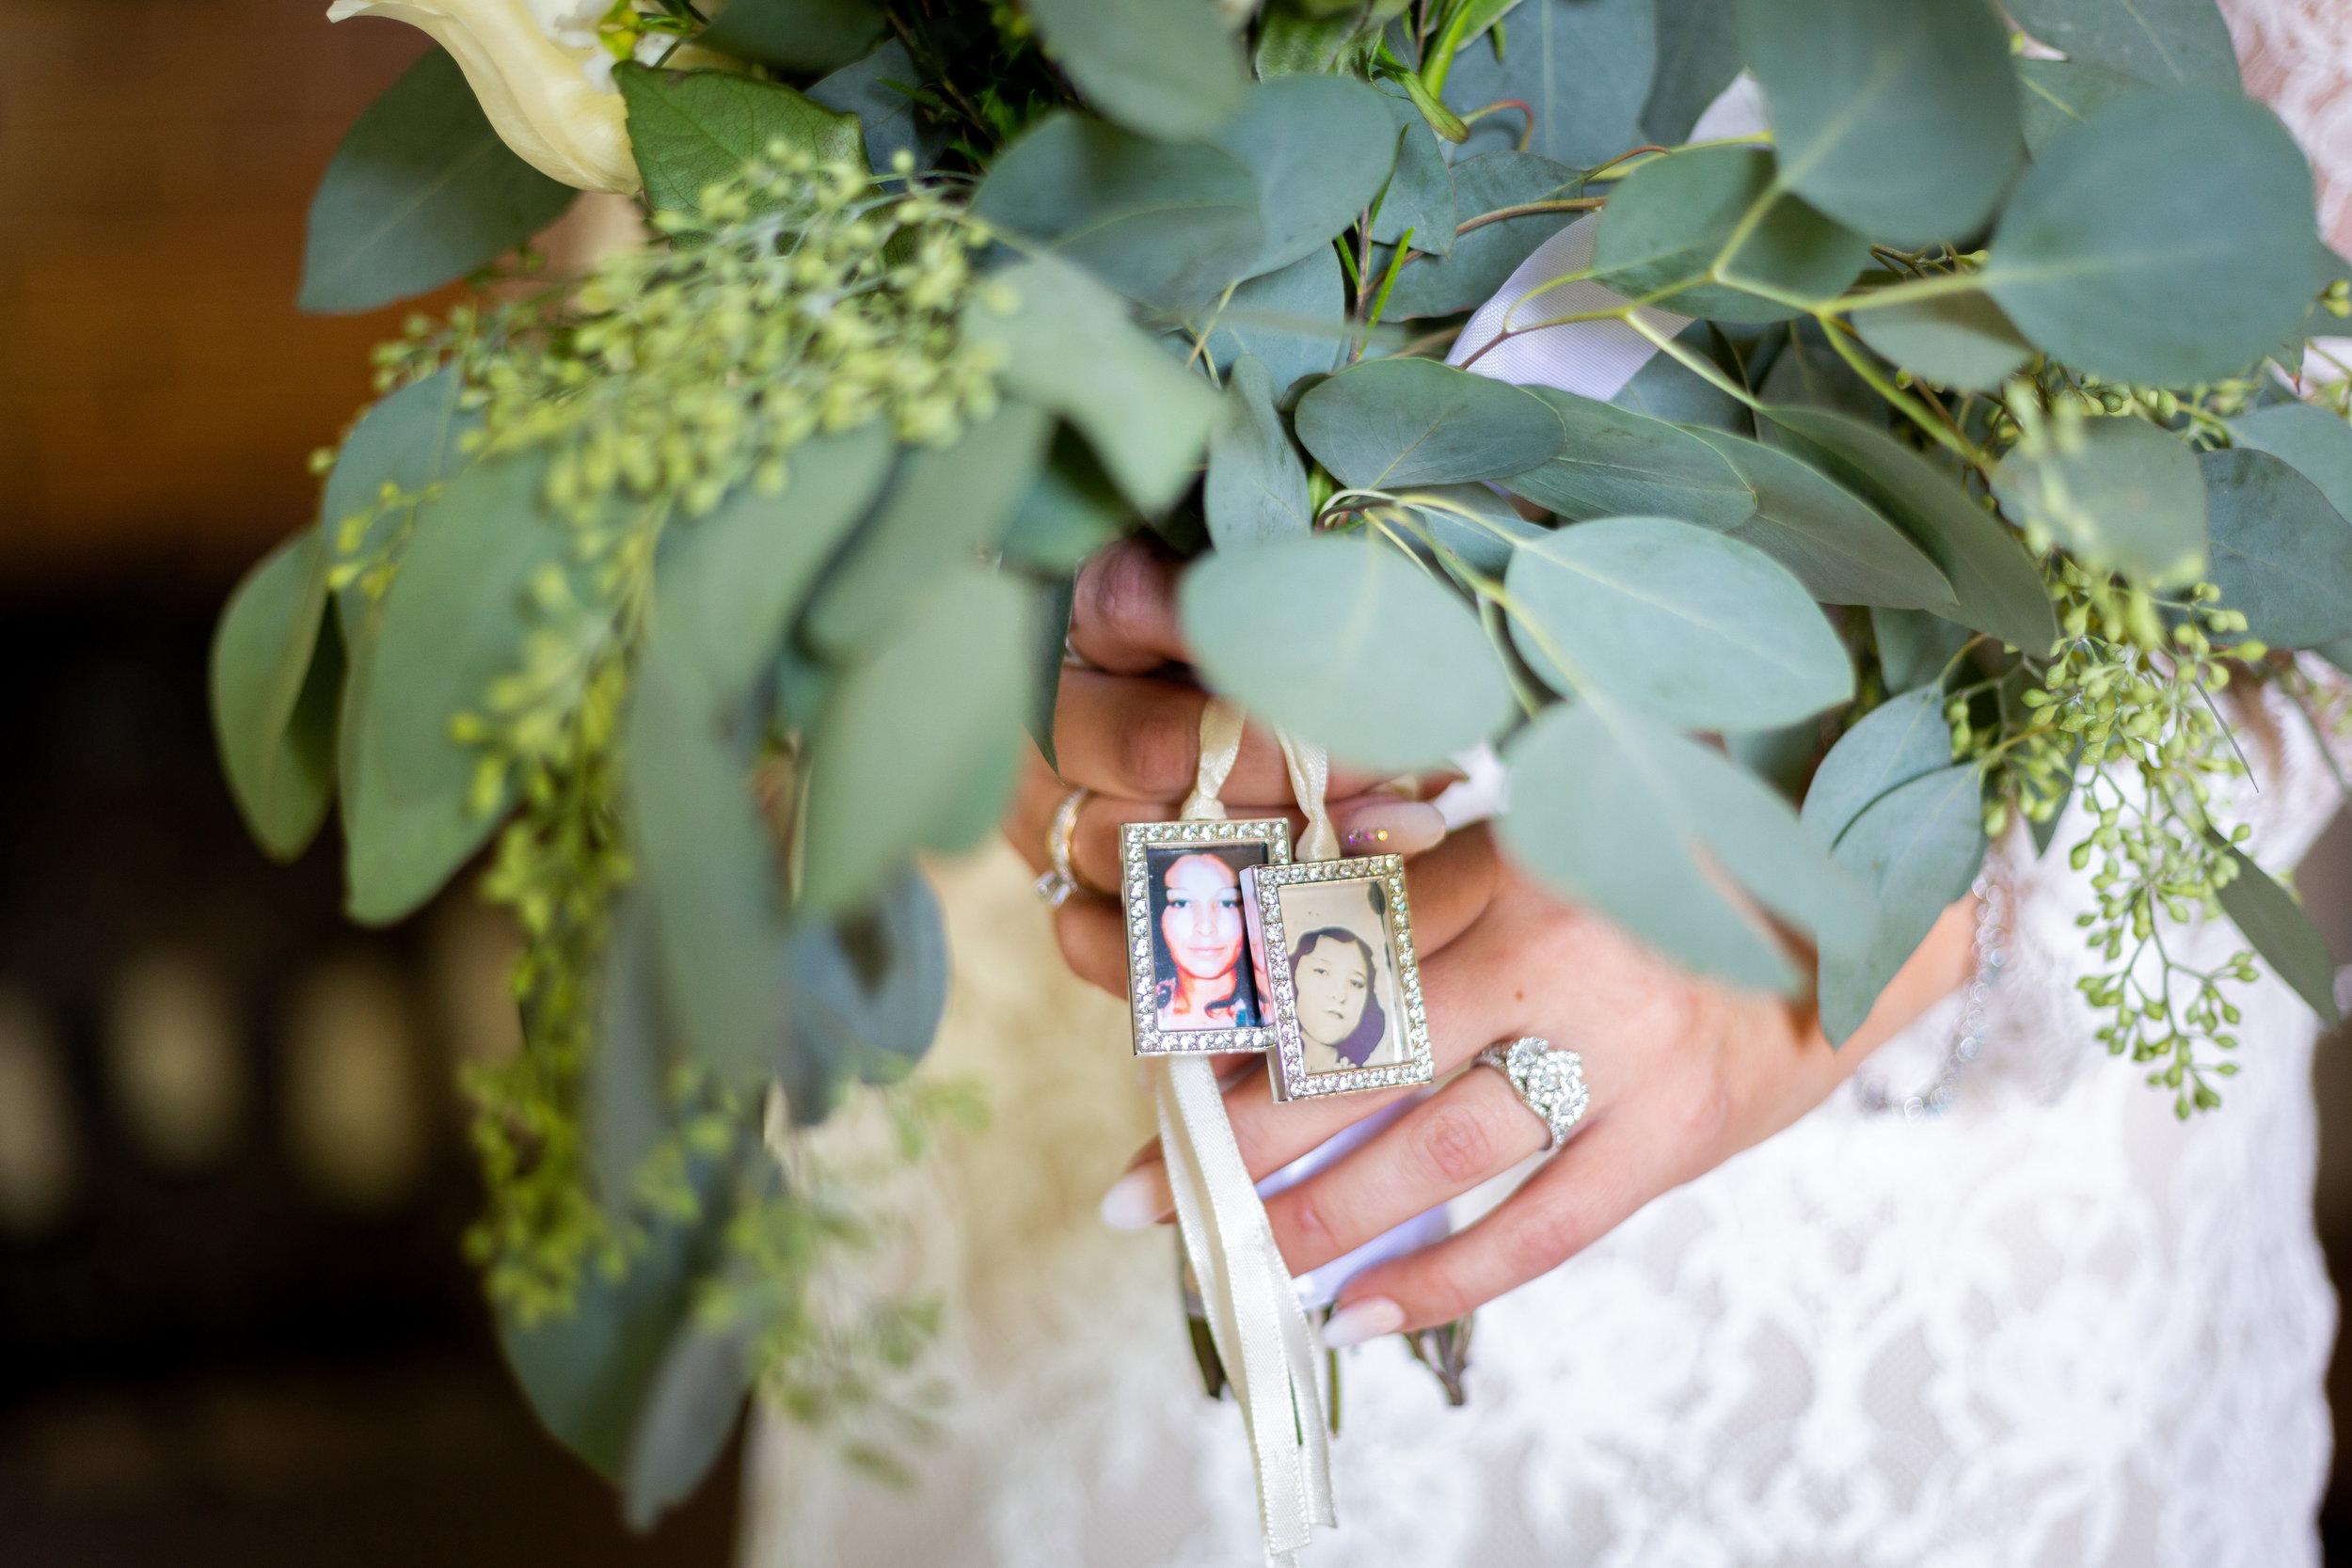 Chase-Annalise-Bontanic Gardens-Chatfield-Denver-Wedding-31.JPG